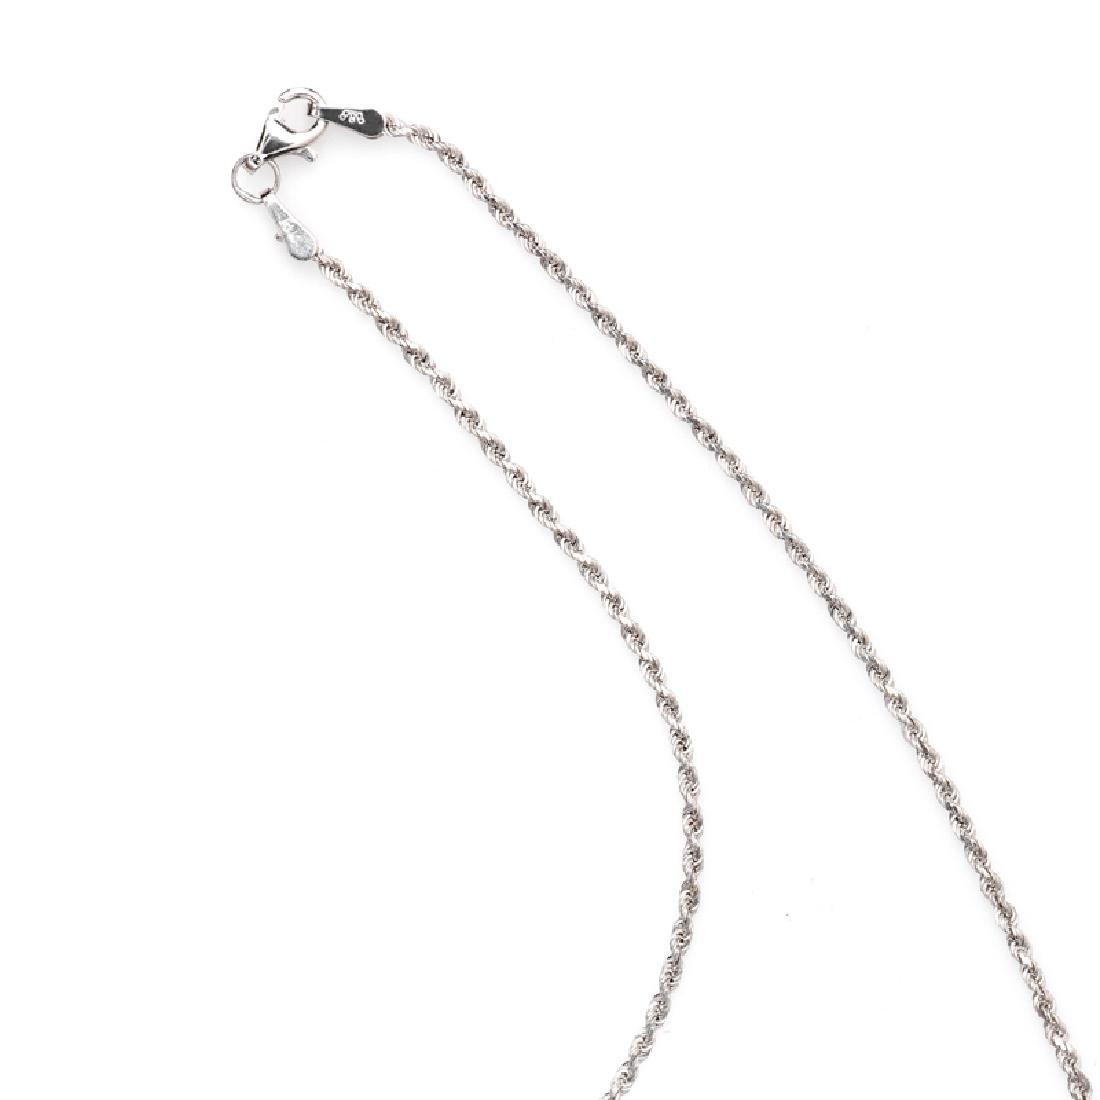 *Fine Jewelry 14 KT White Gold, Diamond Cut, 5.3GM, - 2